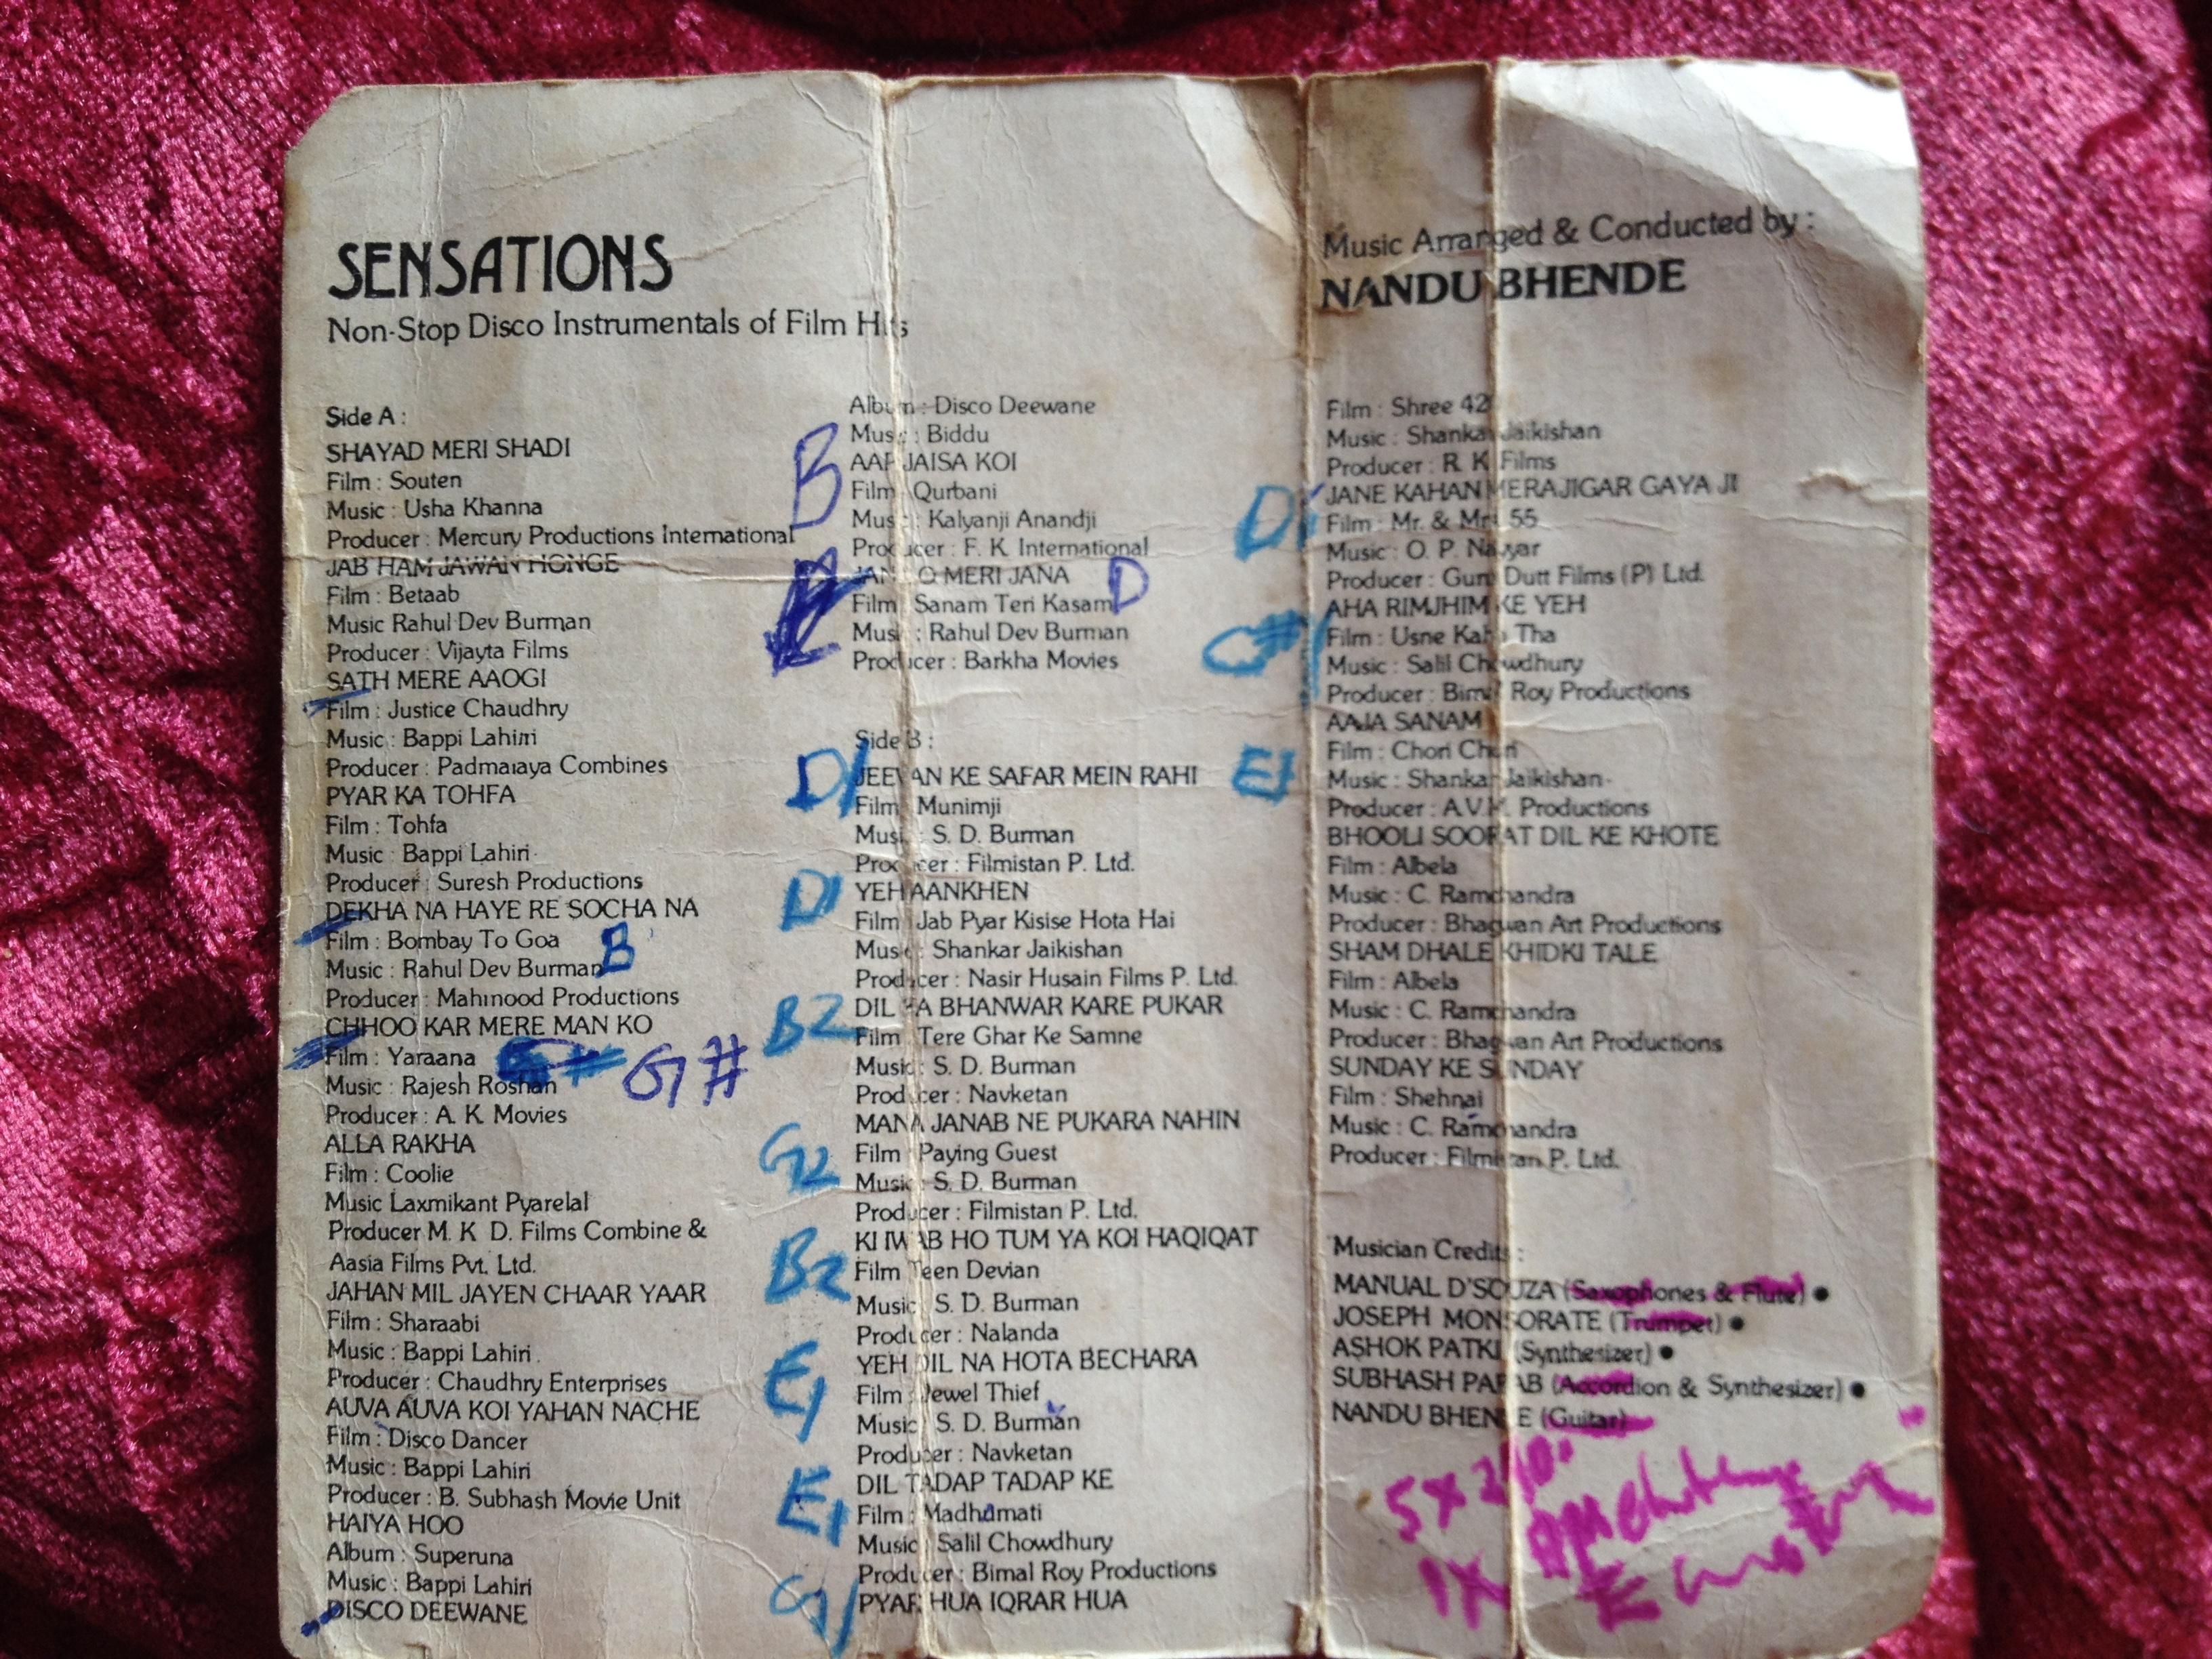 Young Rebel Set Unforgiven Chords Nandu Bhende Sensations Chords